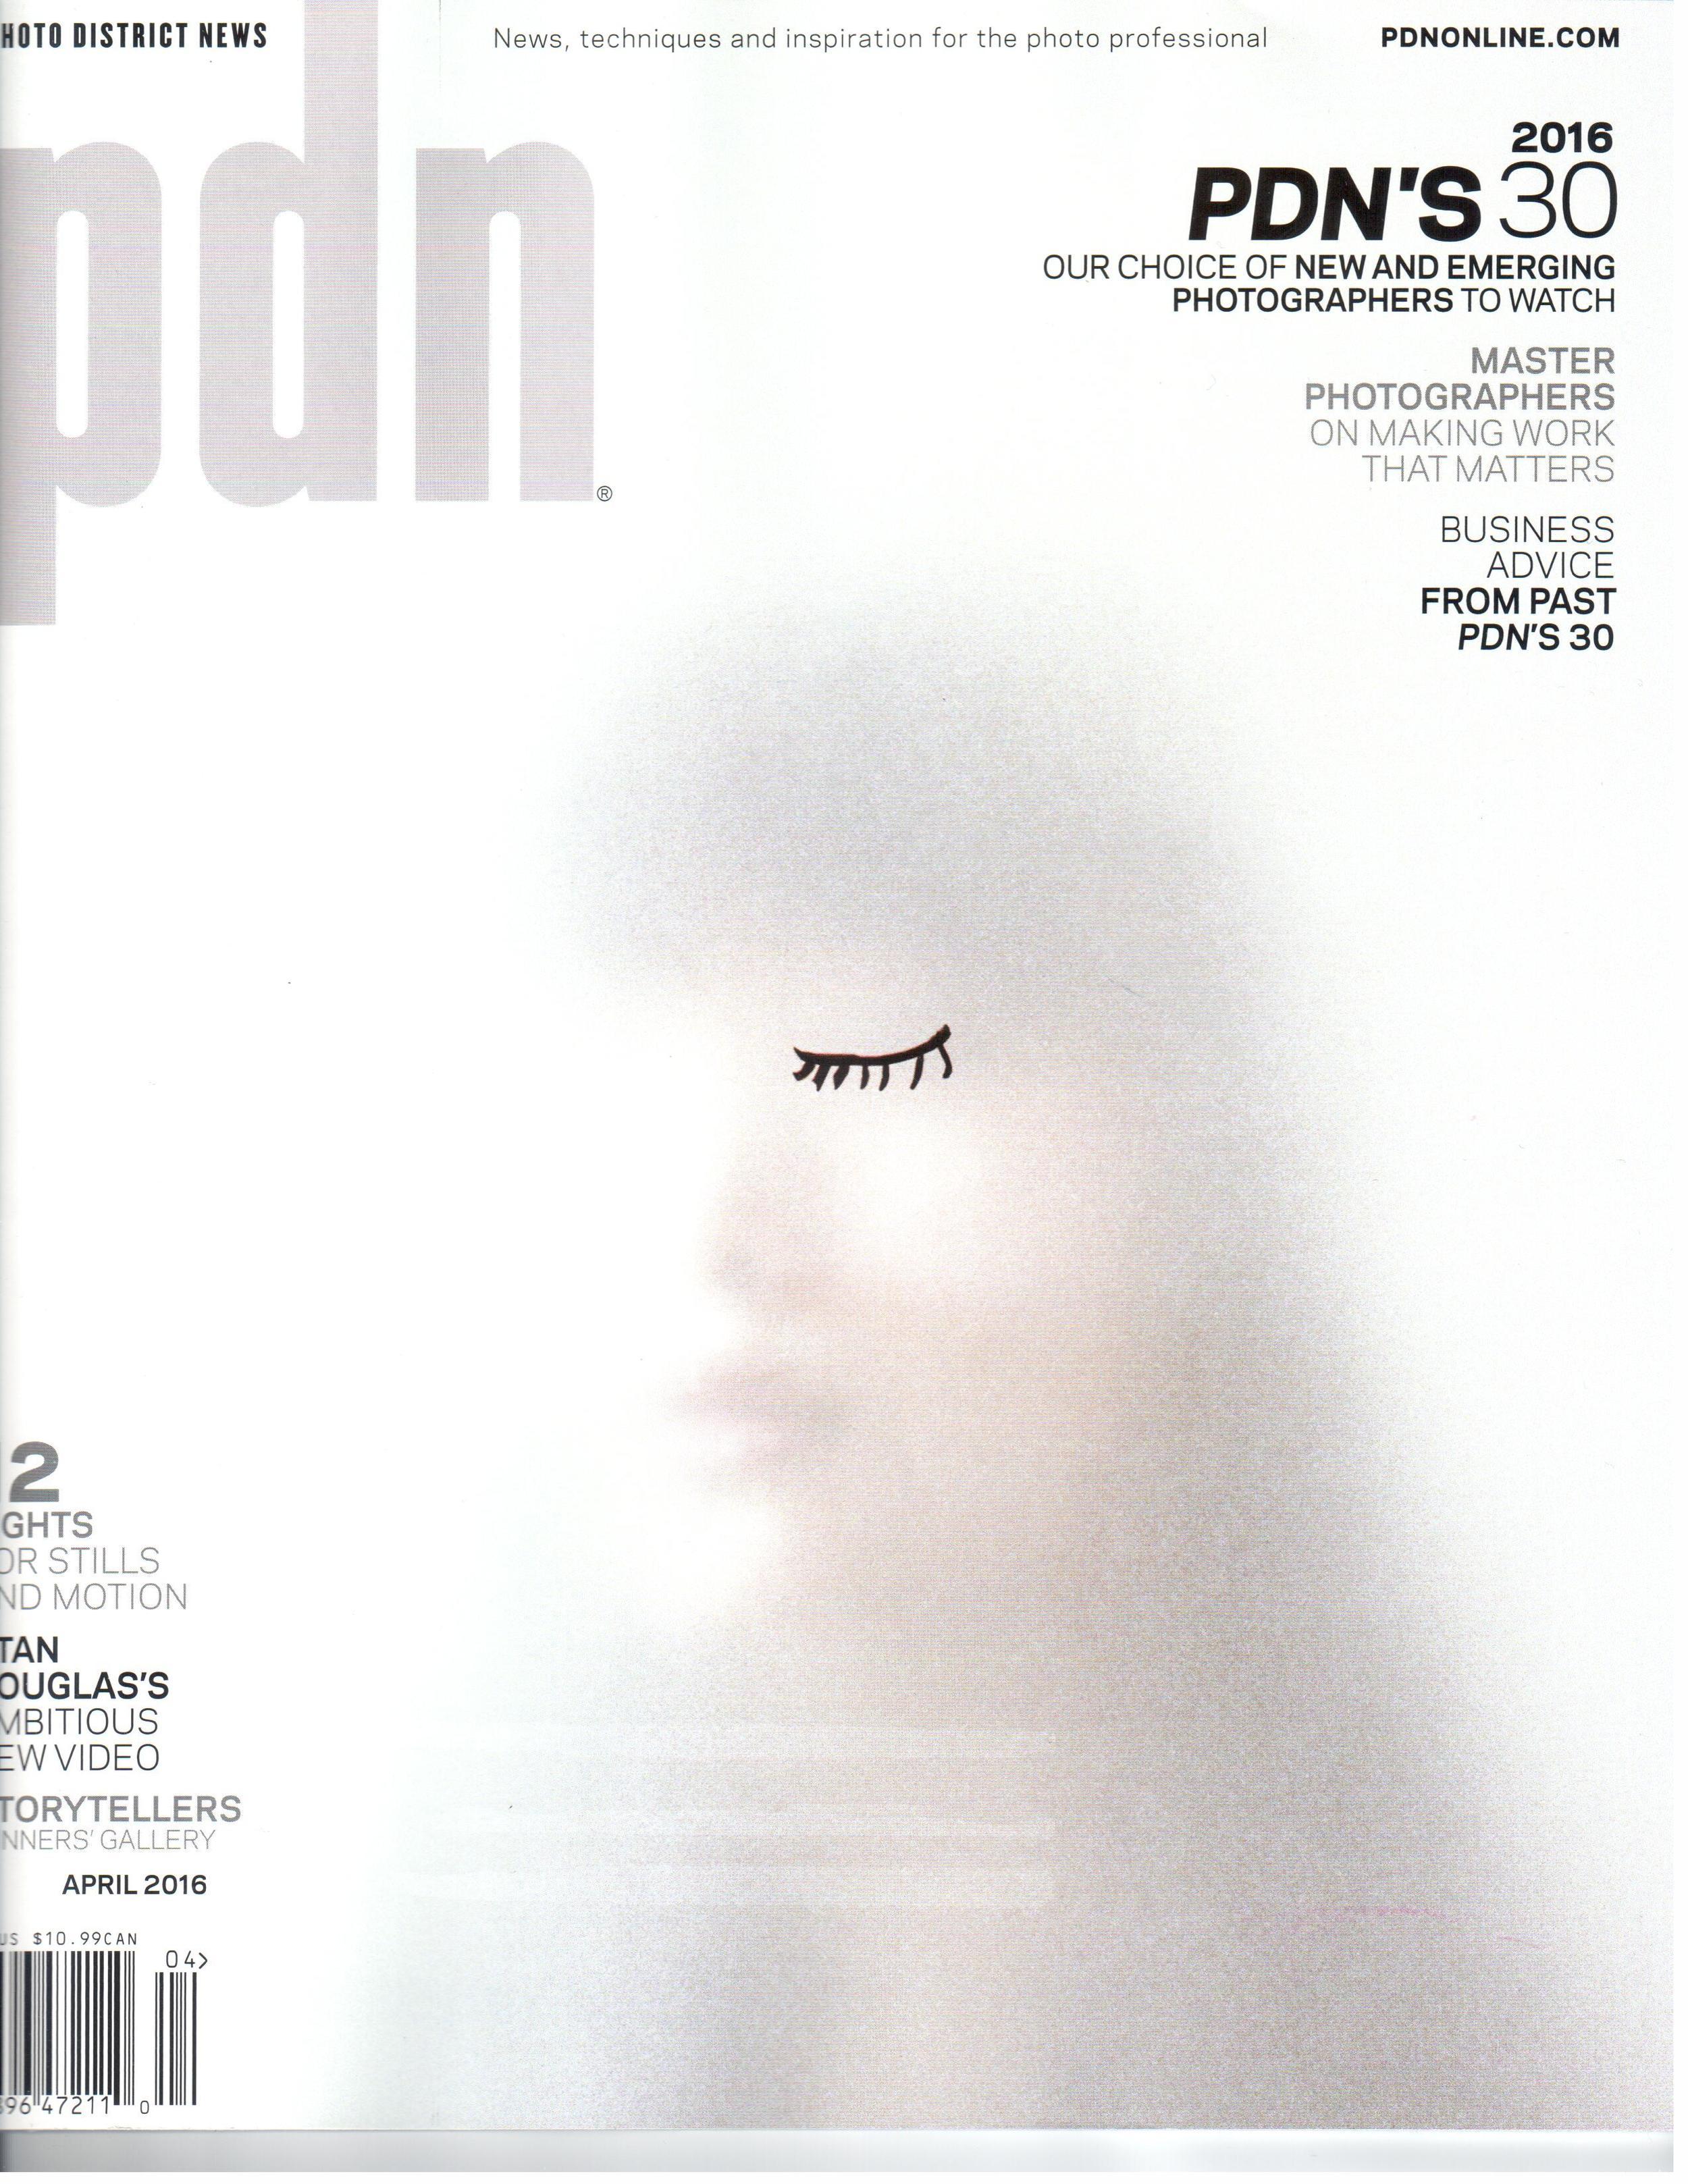 Cover, PDN, April 2016.